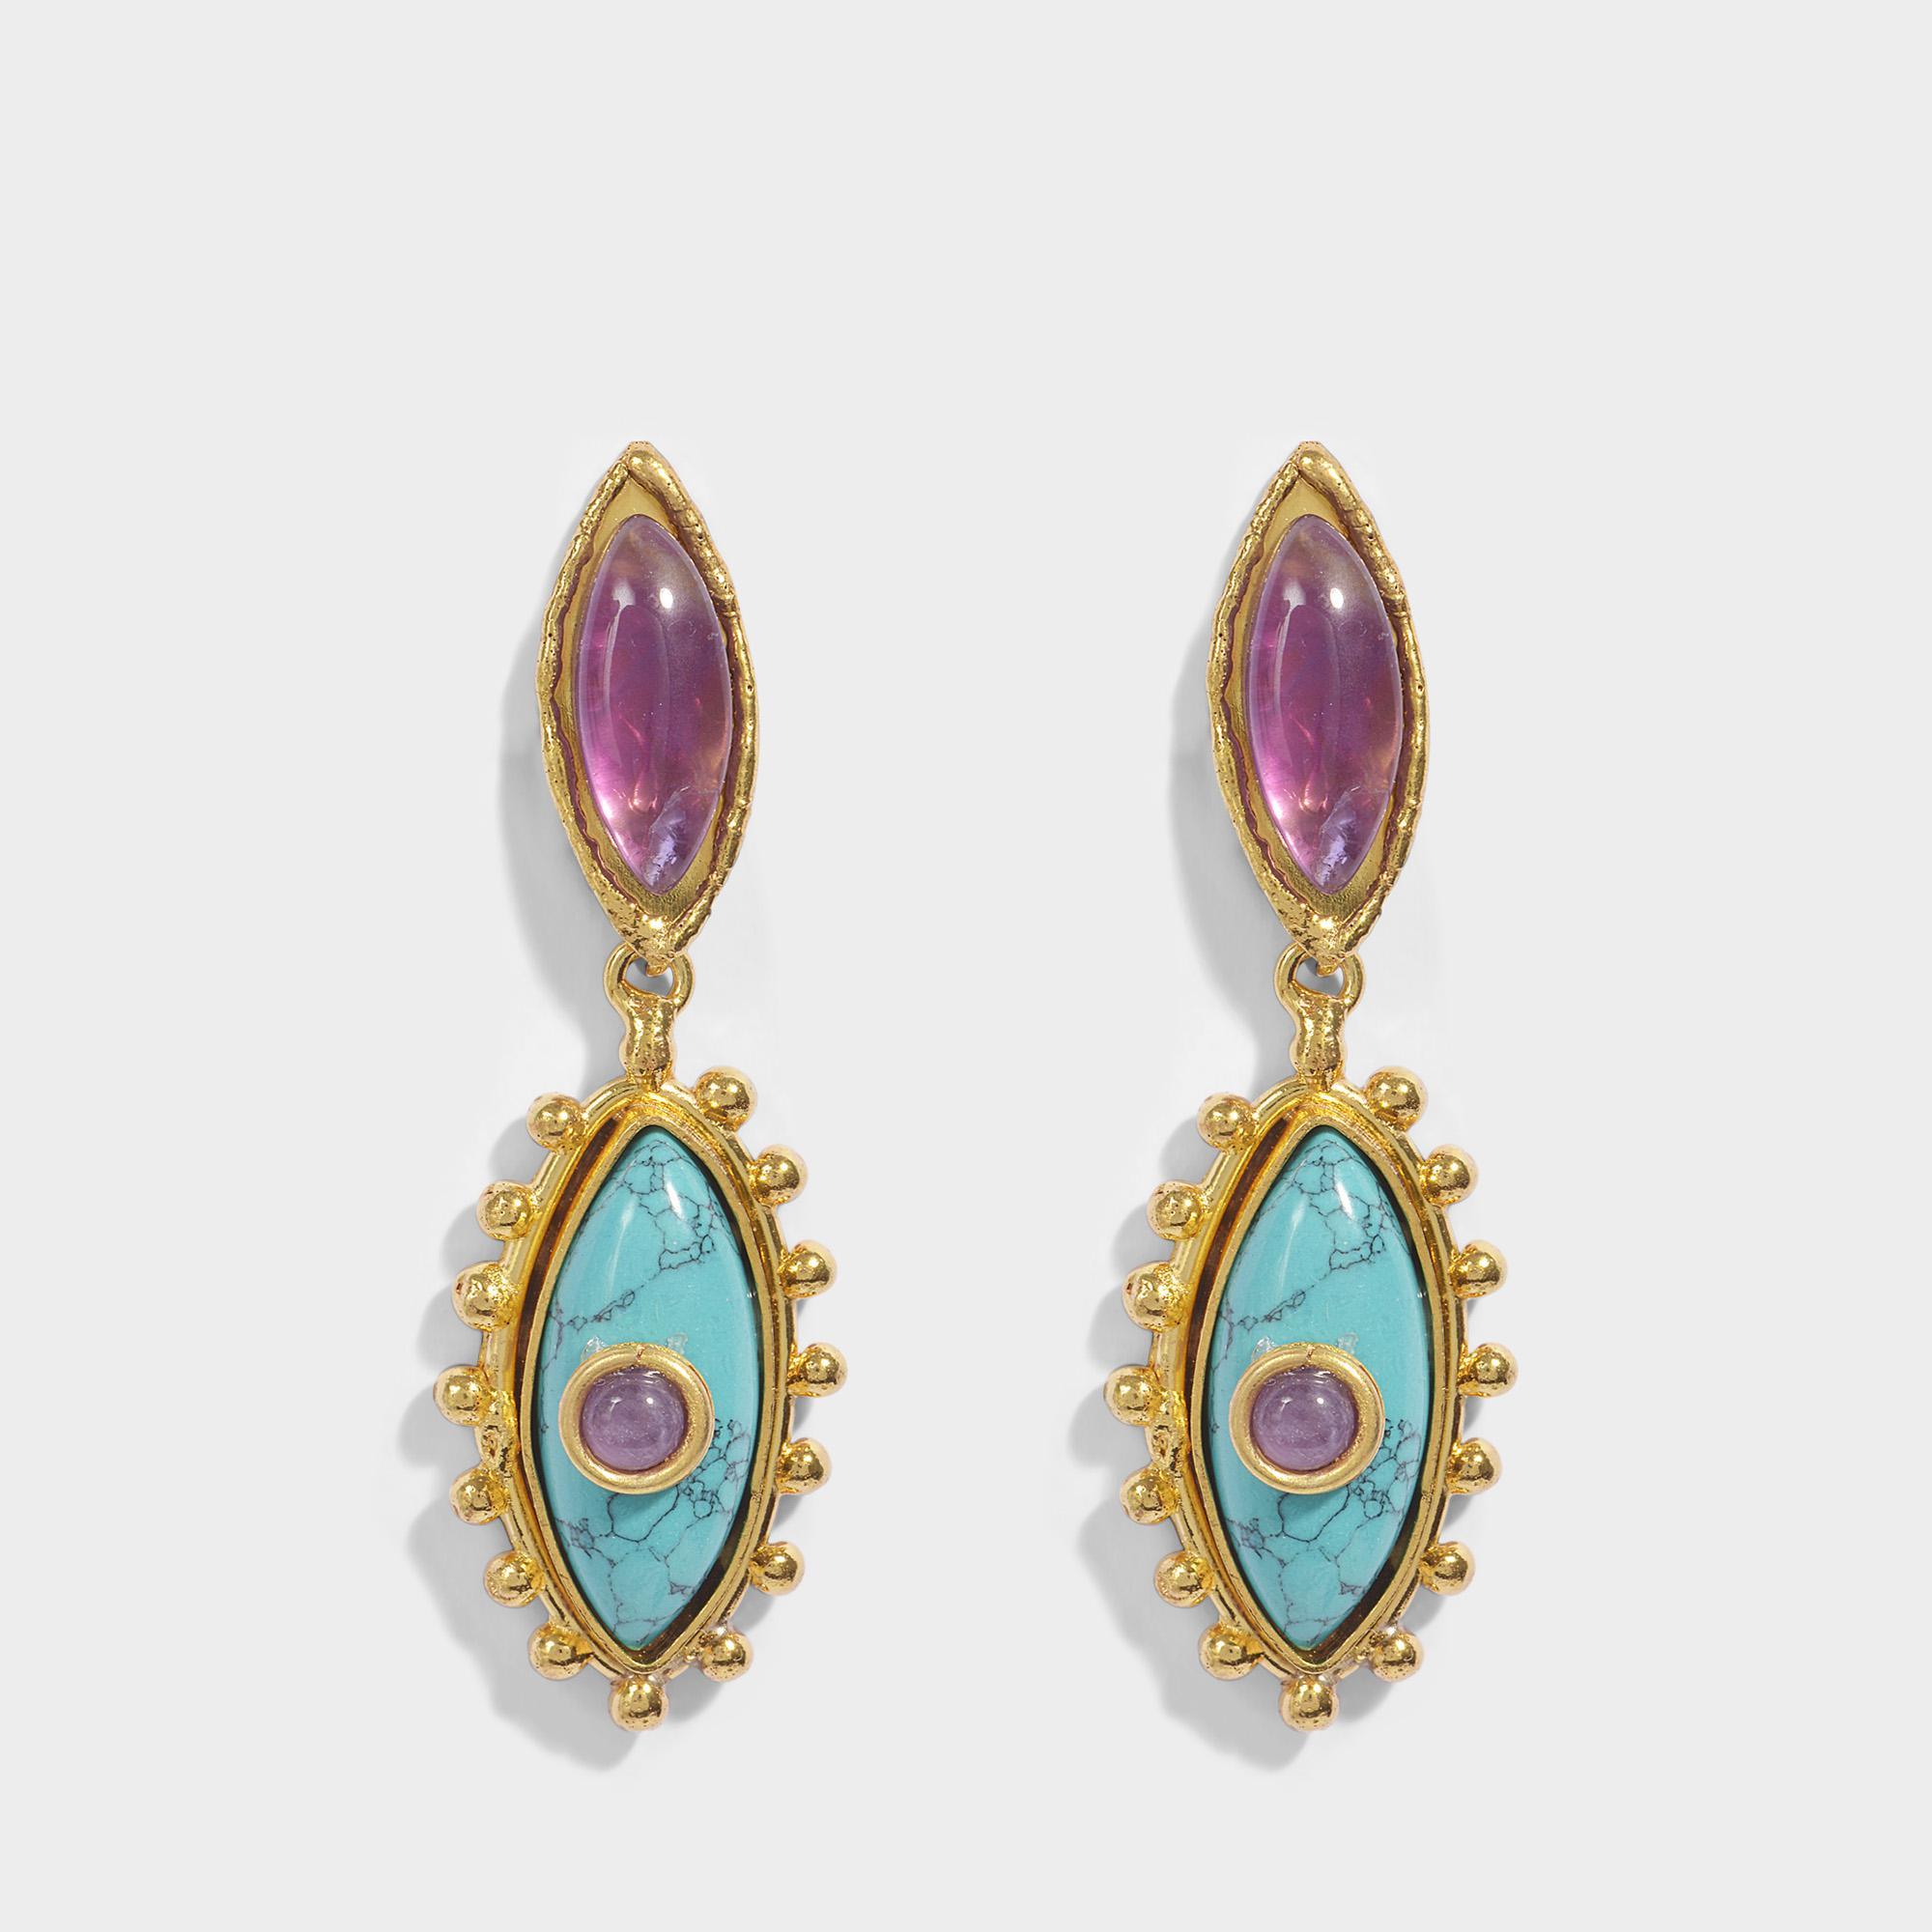 Sylvia Toledano The Third Eye Hoop Earrings in Gold-Plated Brass k2pvC